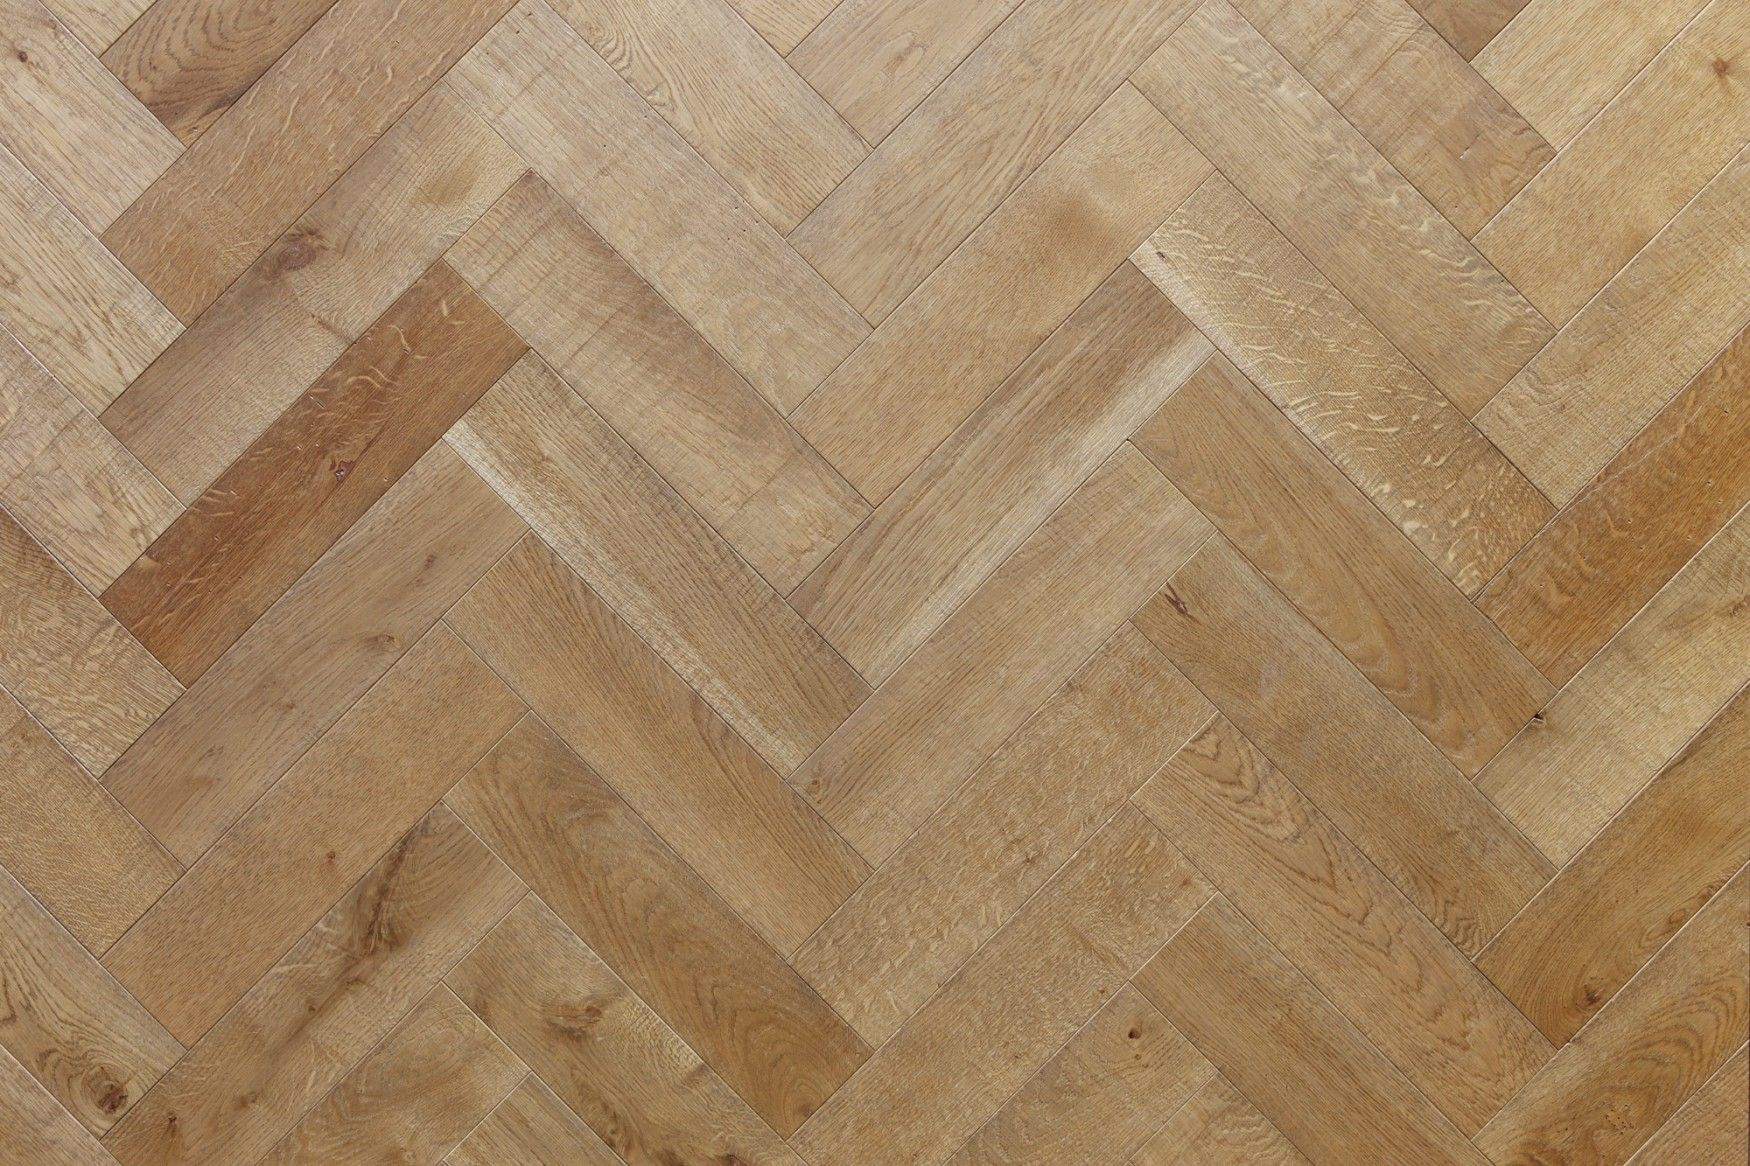 Antique grey distressed oak engineered wood flooring in a